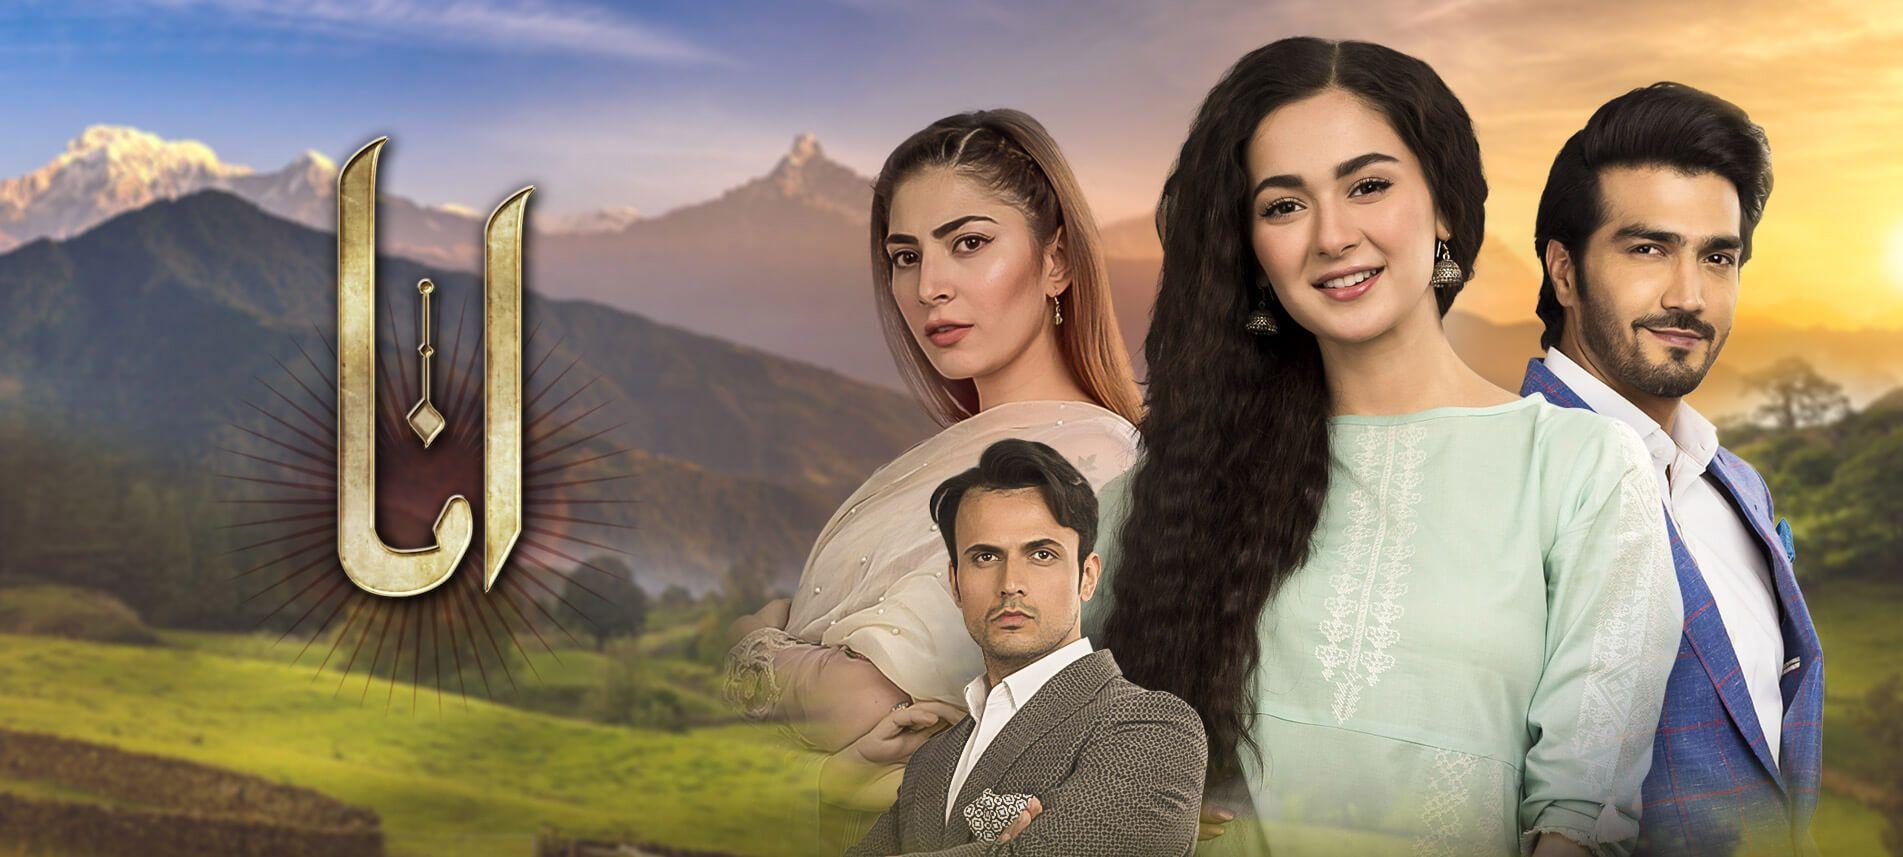 ce308275536ee108d84def49de88771c - Best Pakistani dramas in 2019 that you should watch